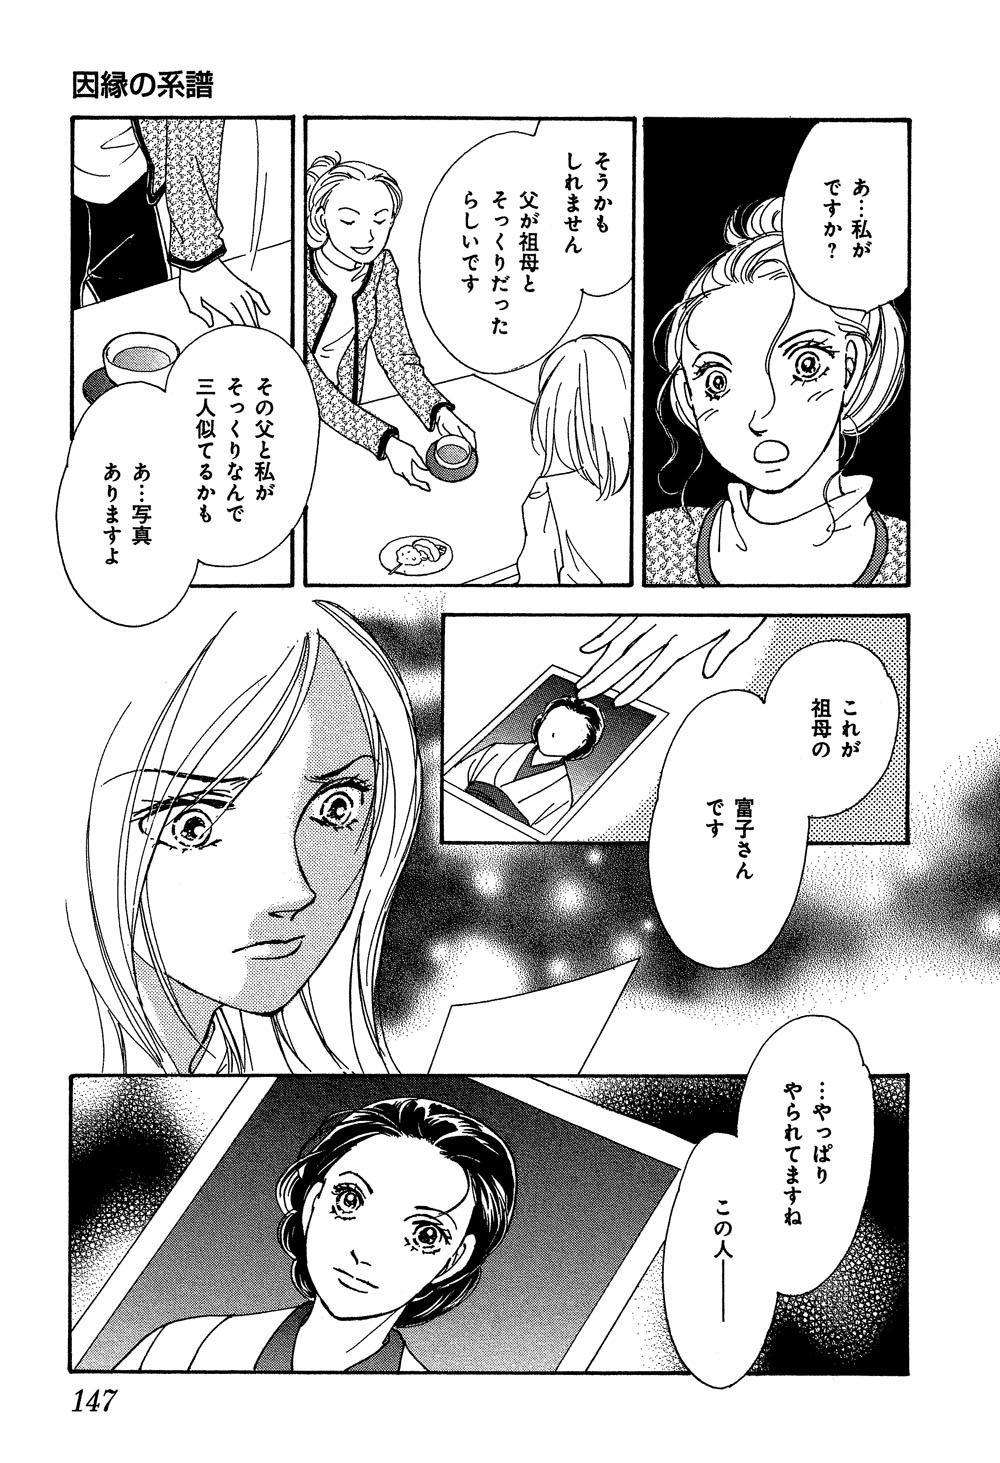 mayuri_0001_0147.jpg